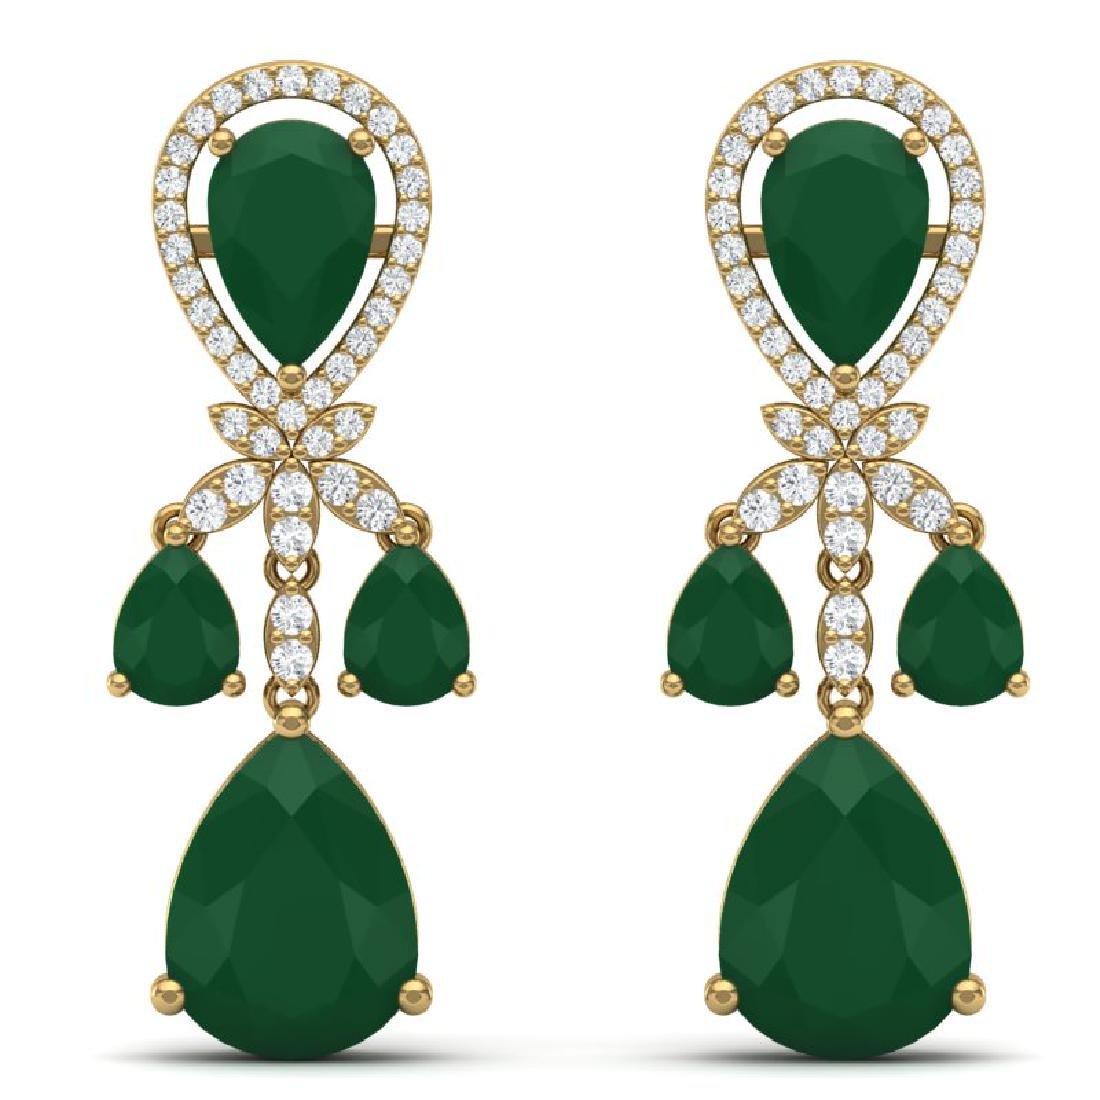 38.29 CTW Royalty Emerald & VS Diamond Earrings 18K